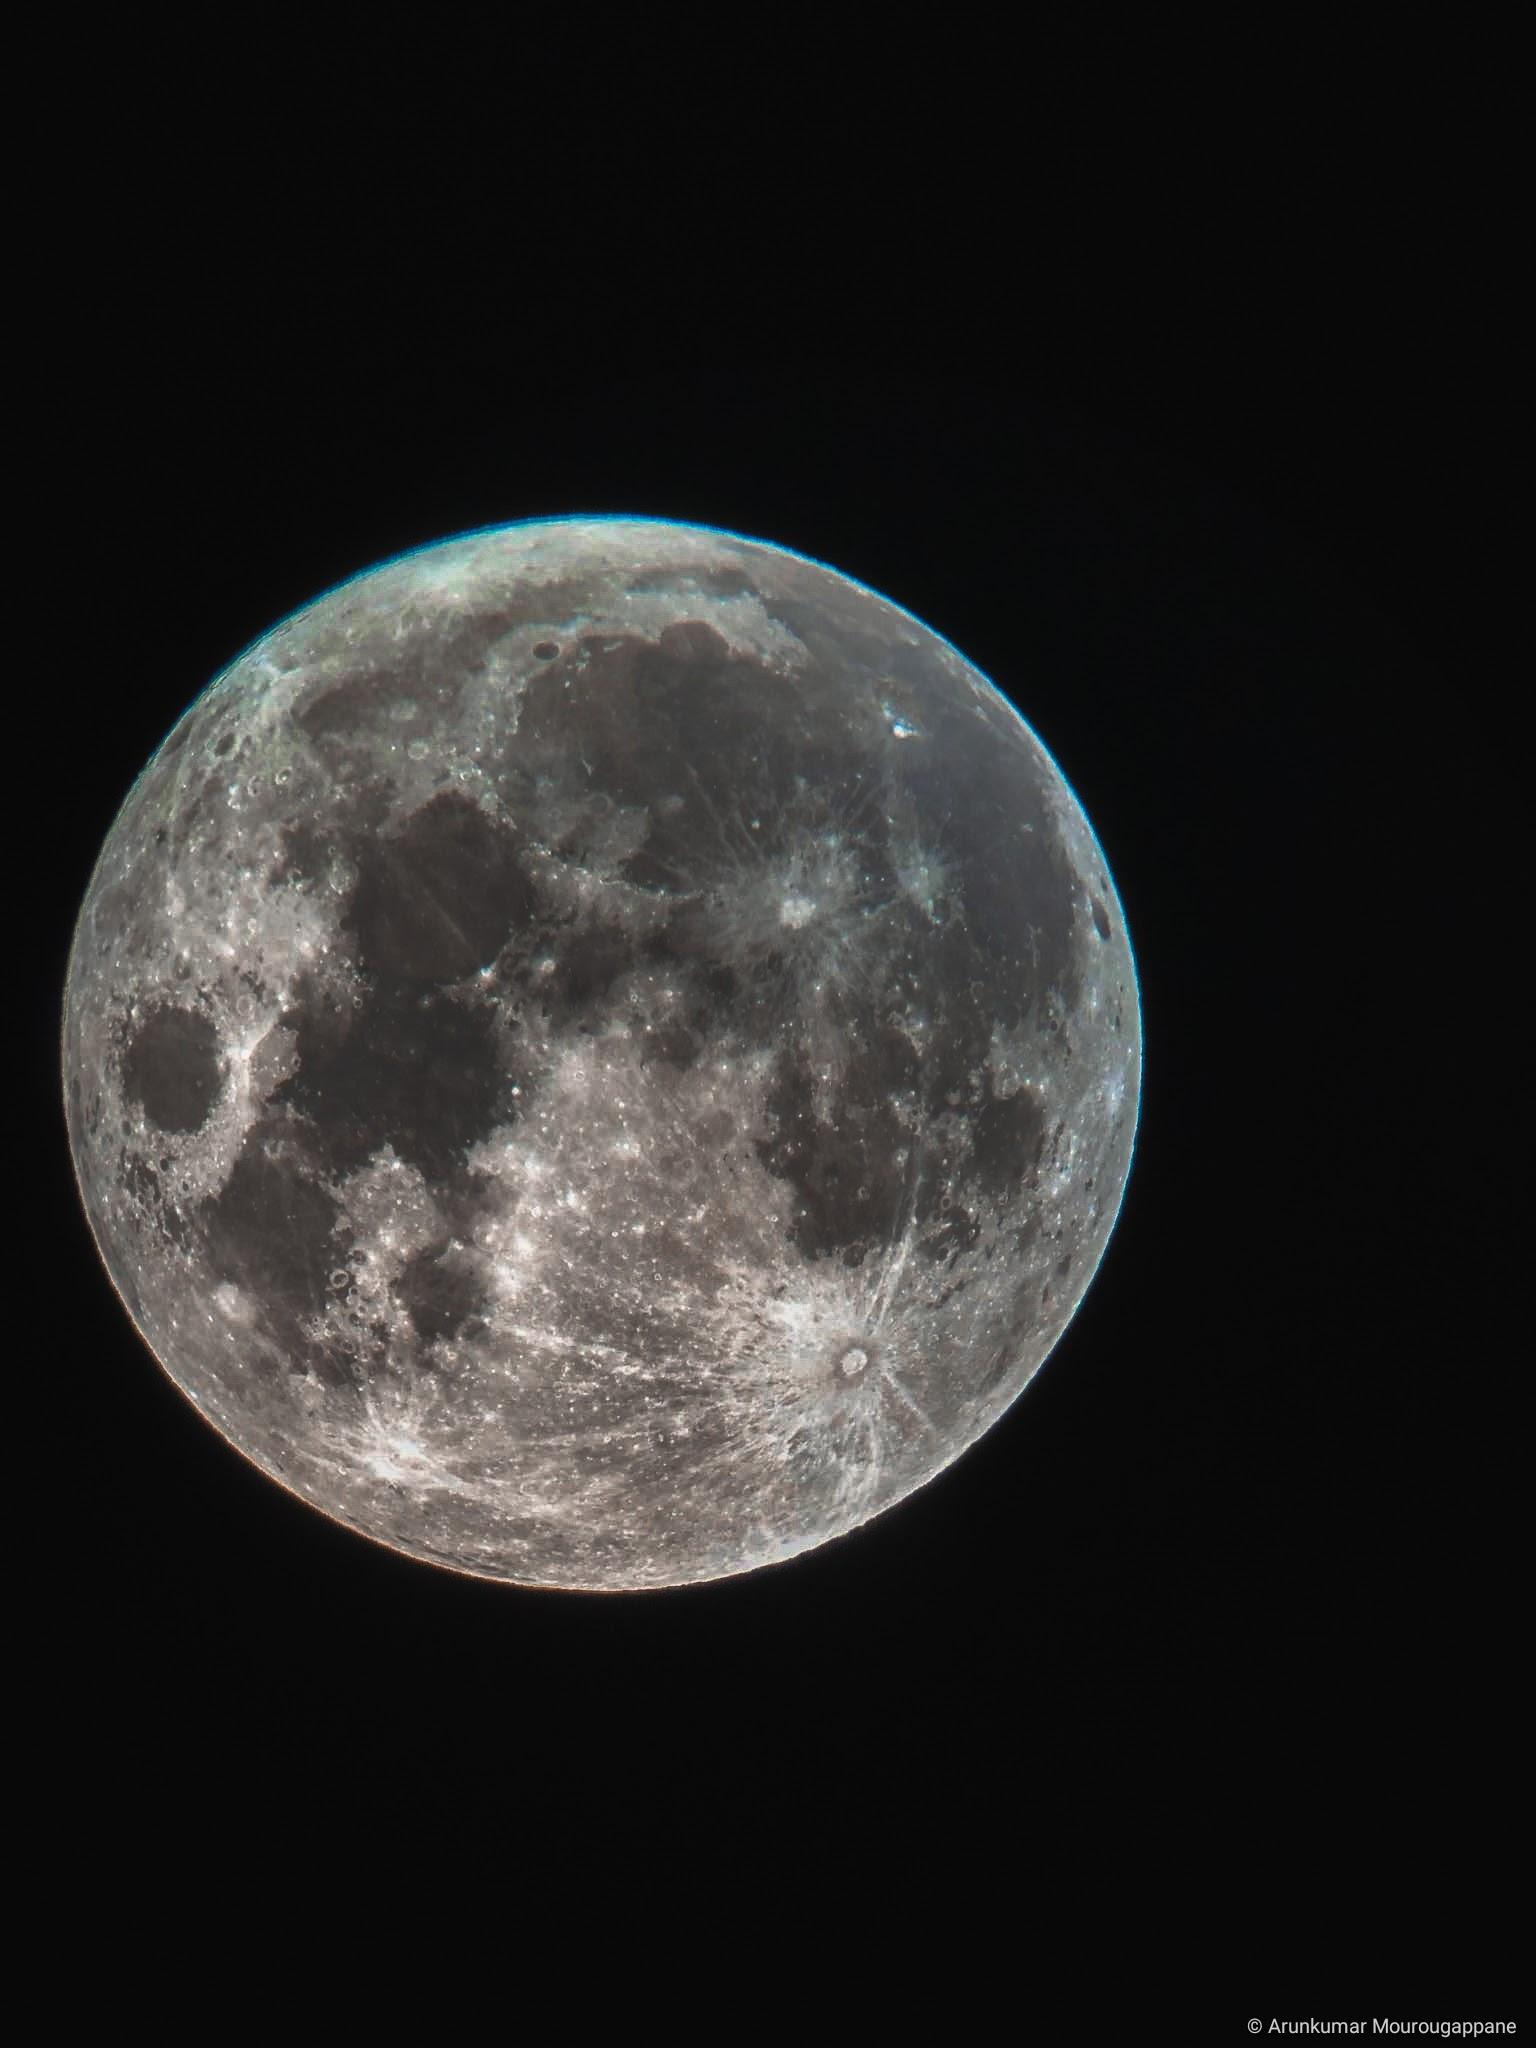 Arunkumar Lunar photography chromatic aberrations